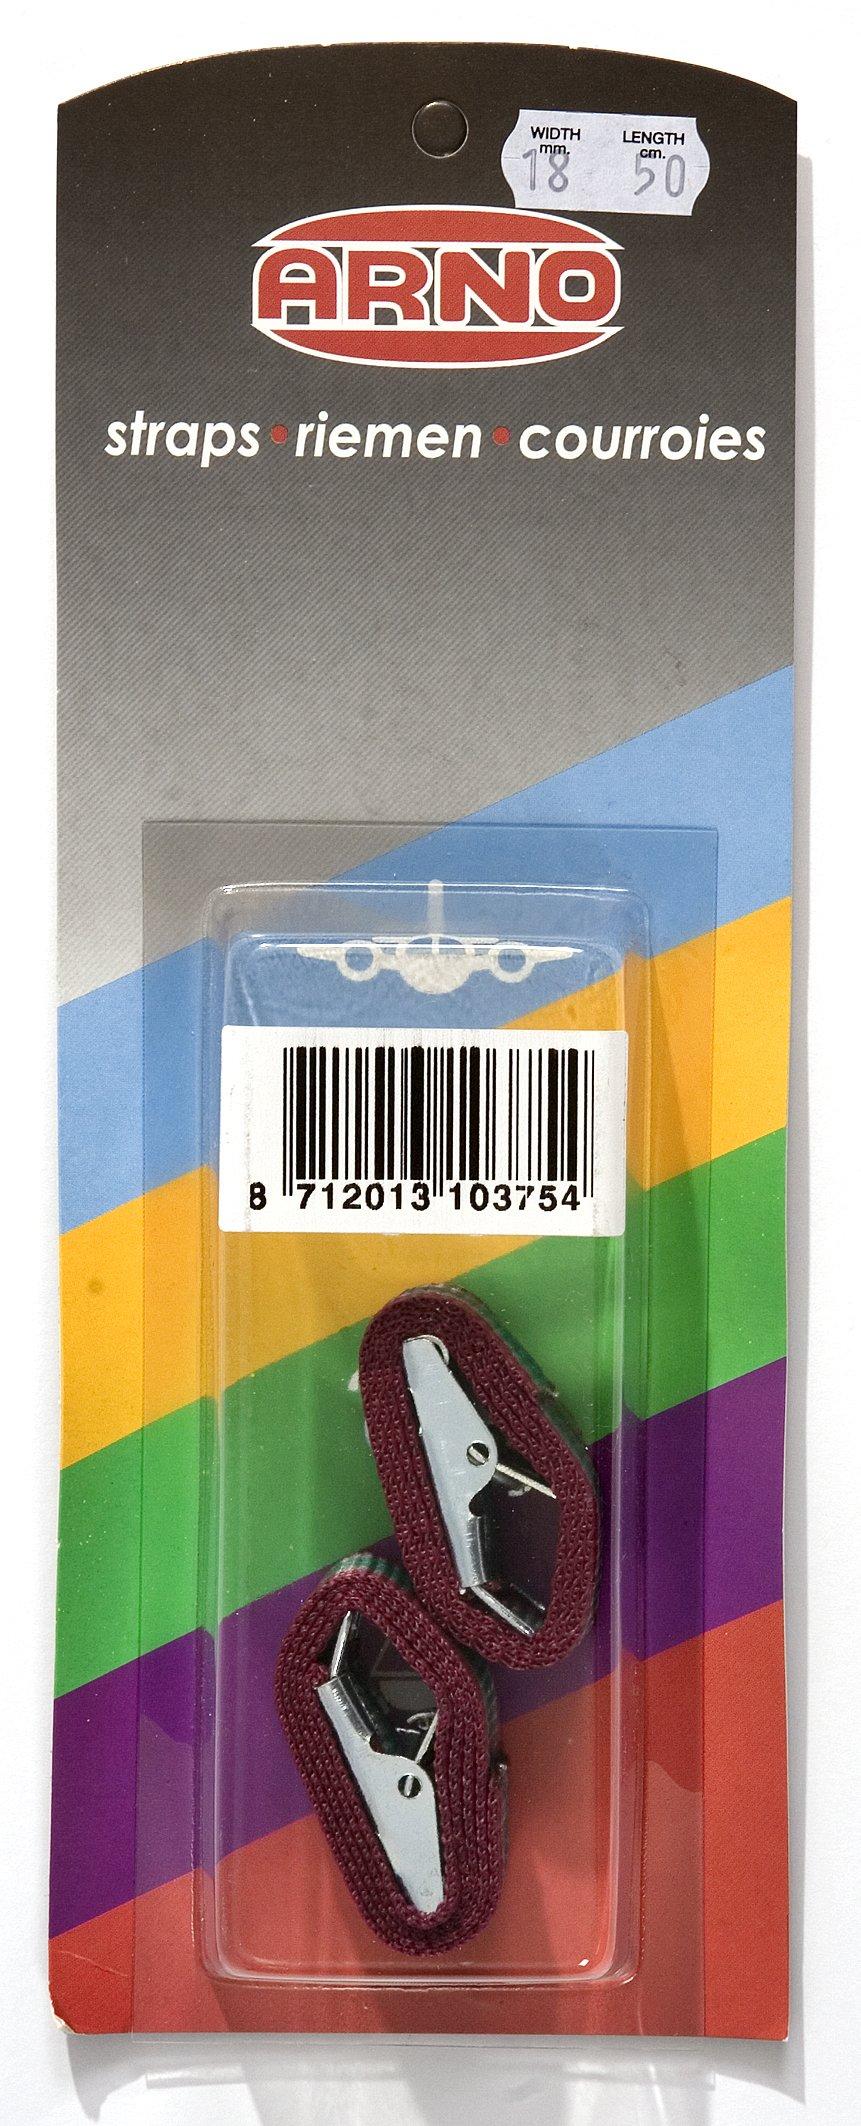 Arno Strap 18mm-150cm 2 pieces card